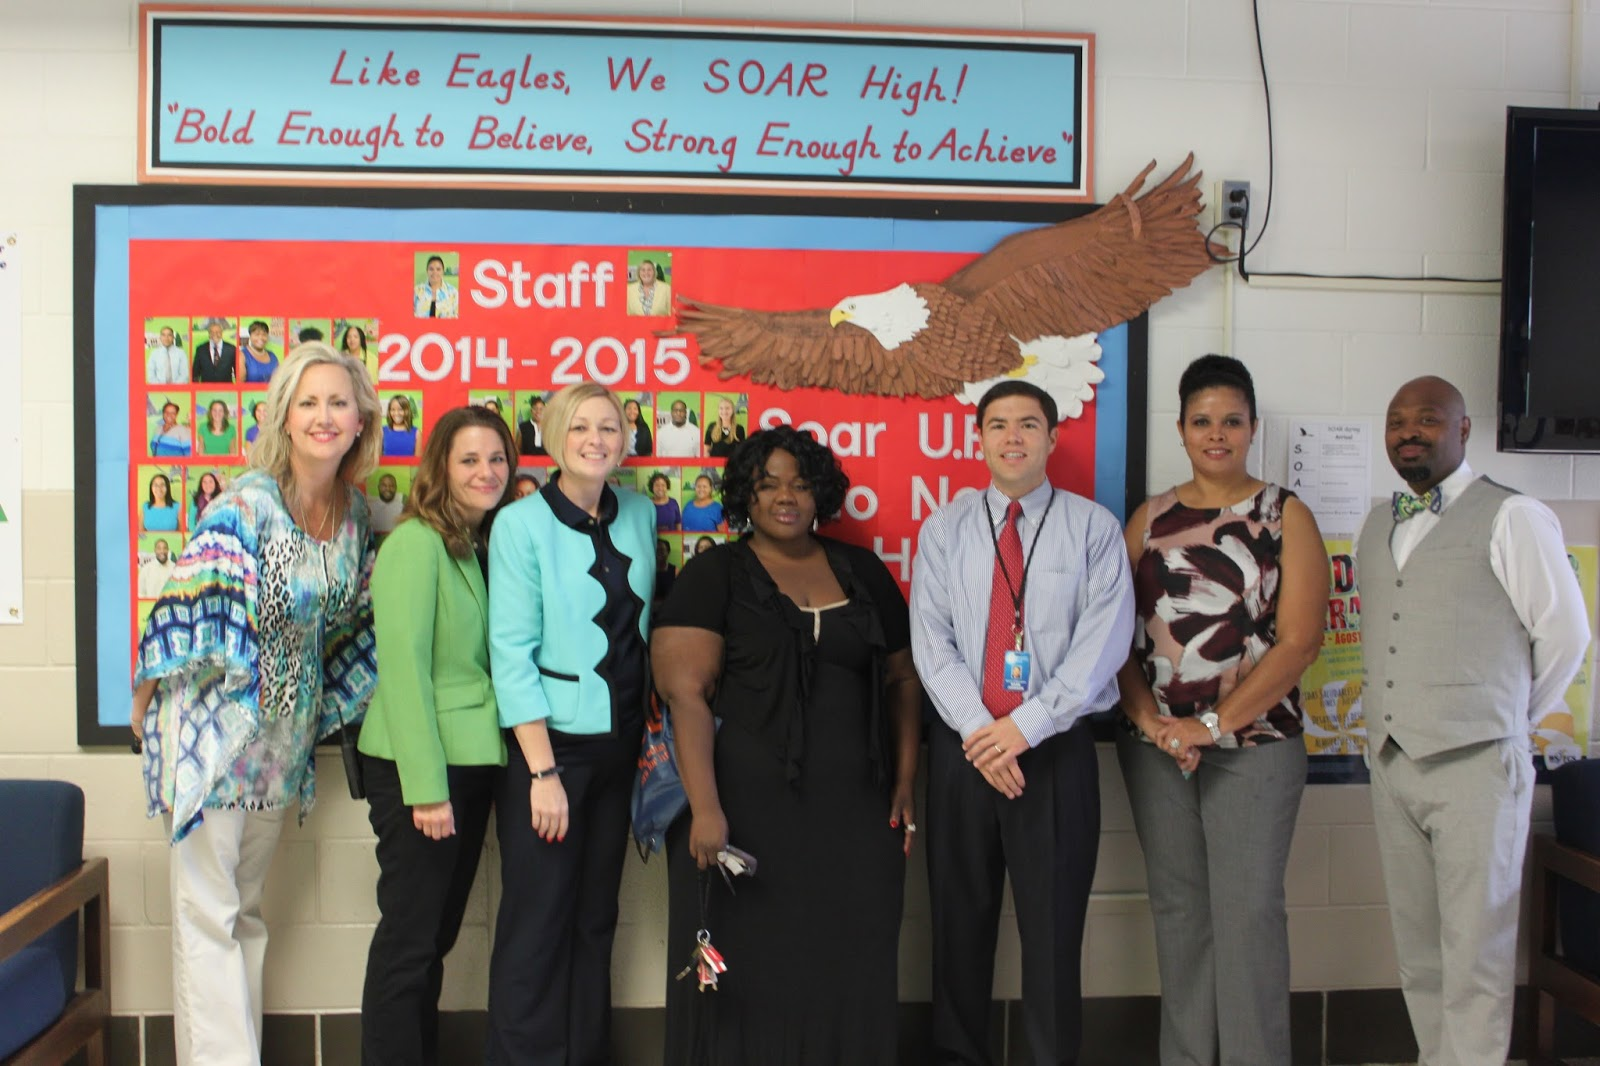 BELL | Winston-Salem/Forsyth County Schools: Two School